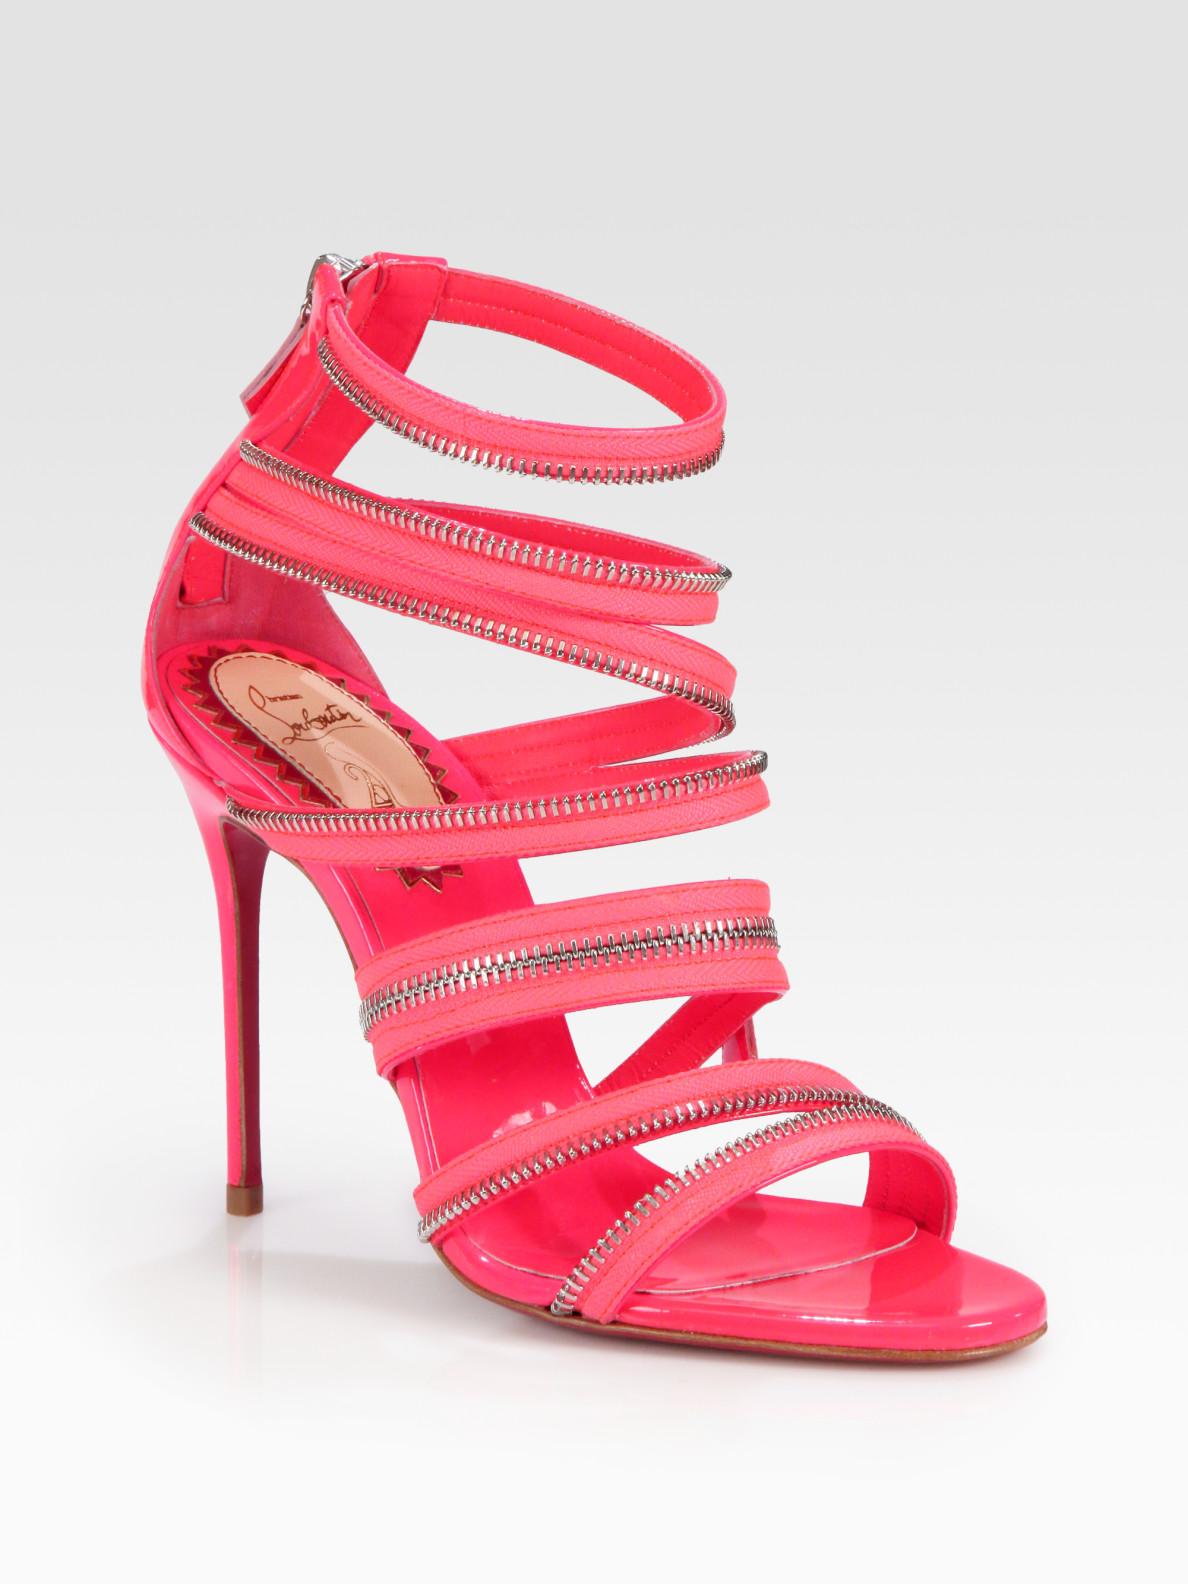 Artesur ? christian louboutin sandals Pink patent leather